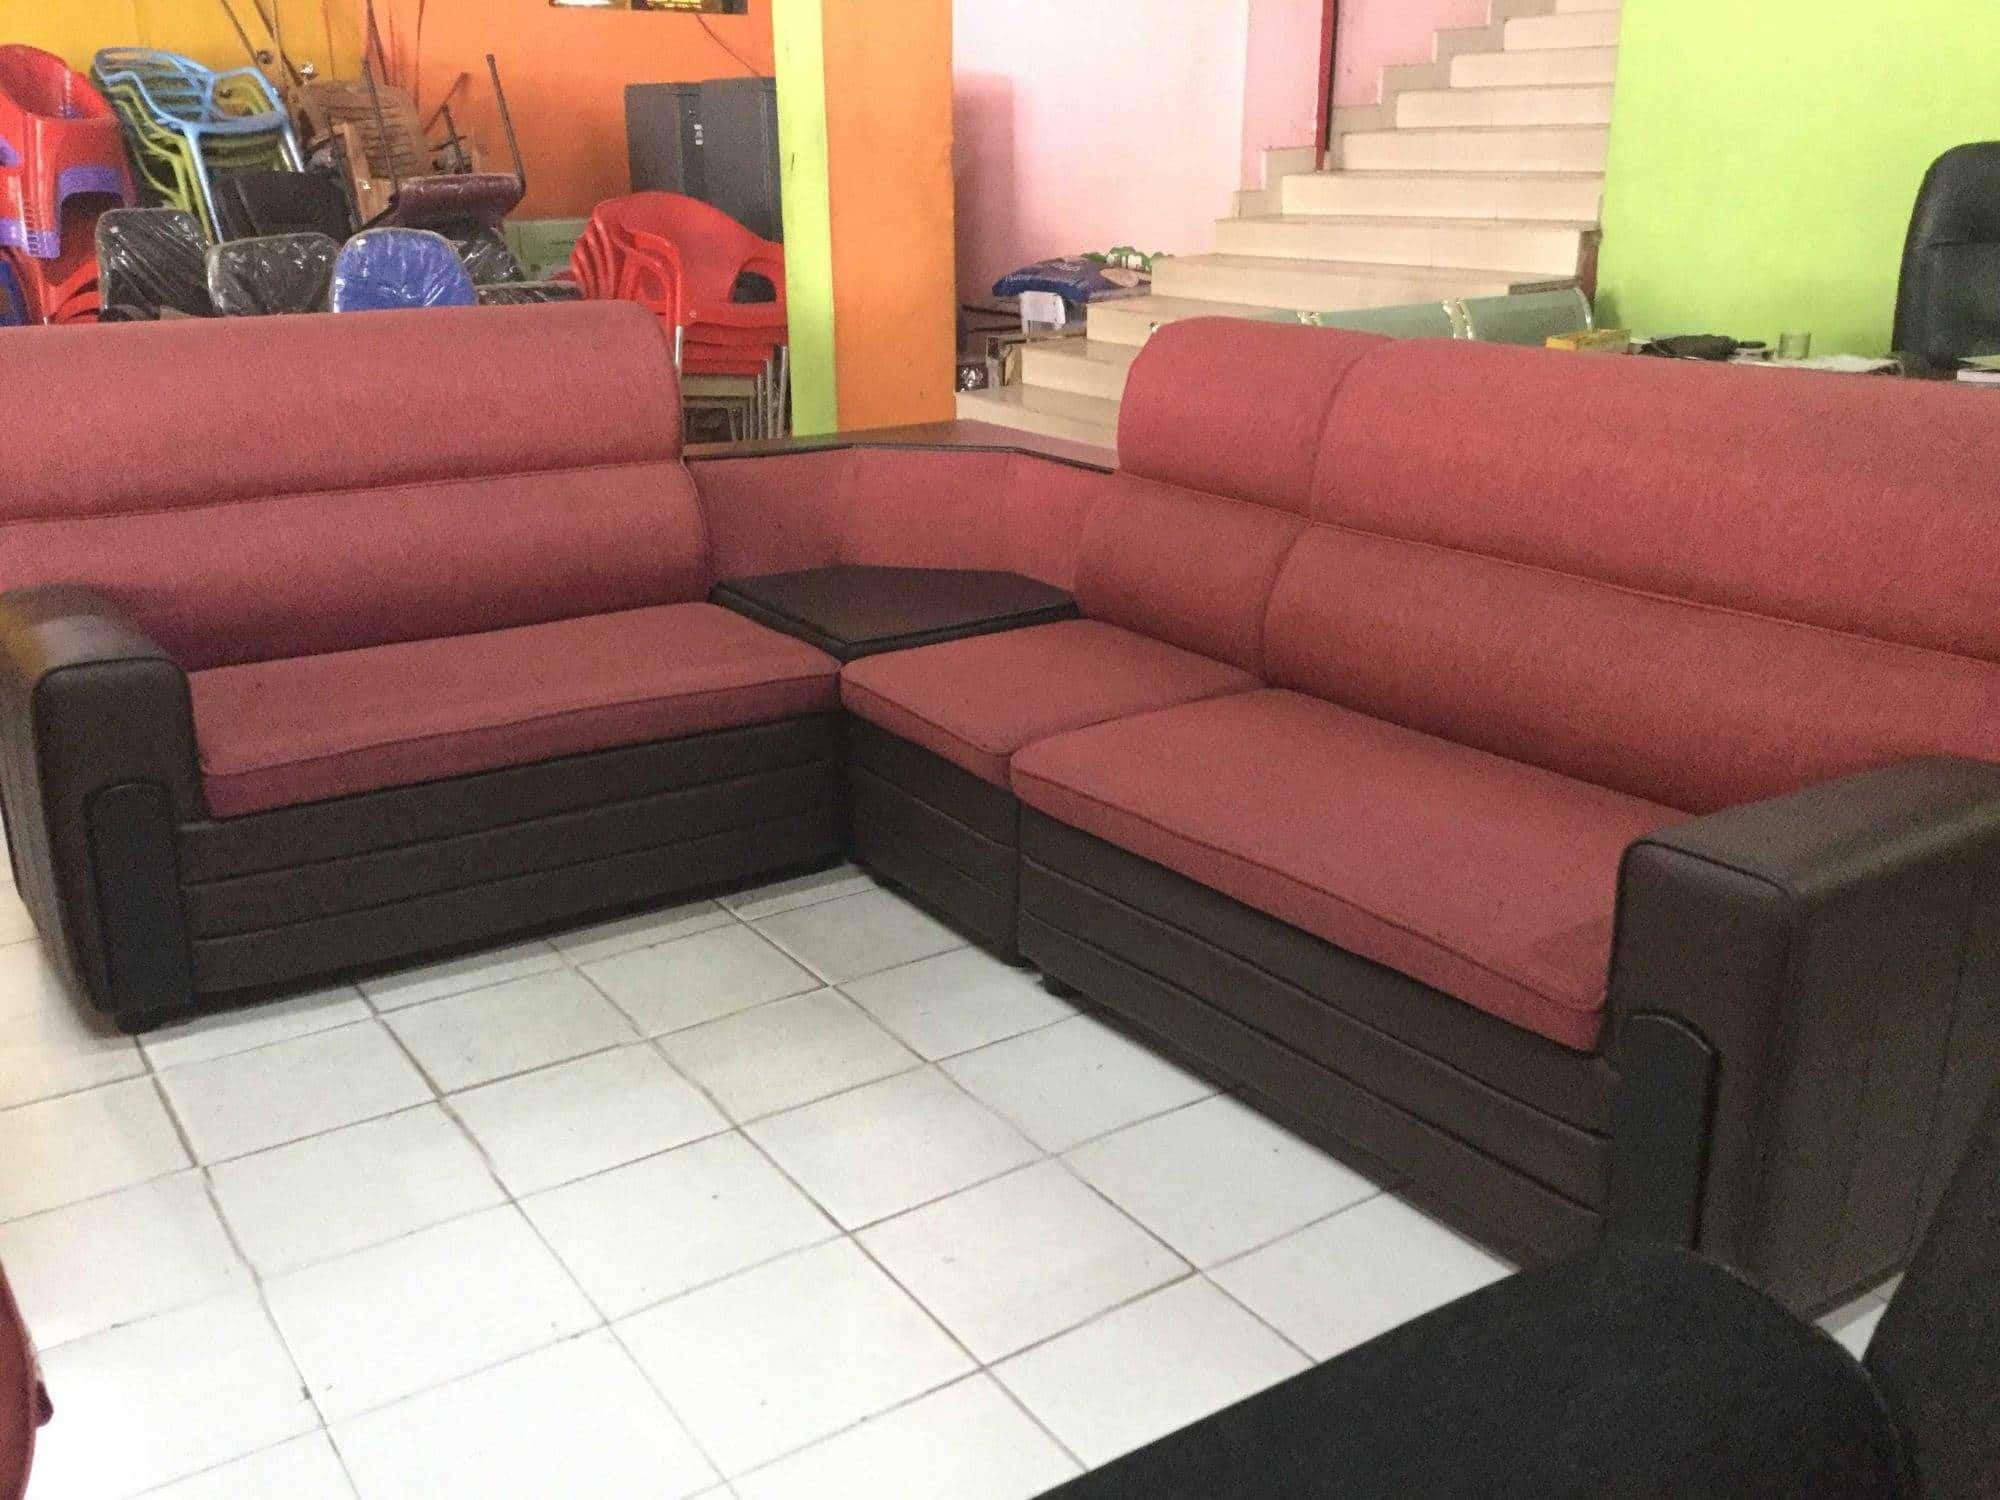 Impulse Designers Furniture Factory Outlet, Kalamassery   Furniture Dealers  In Ernakulam   Justdial